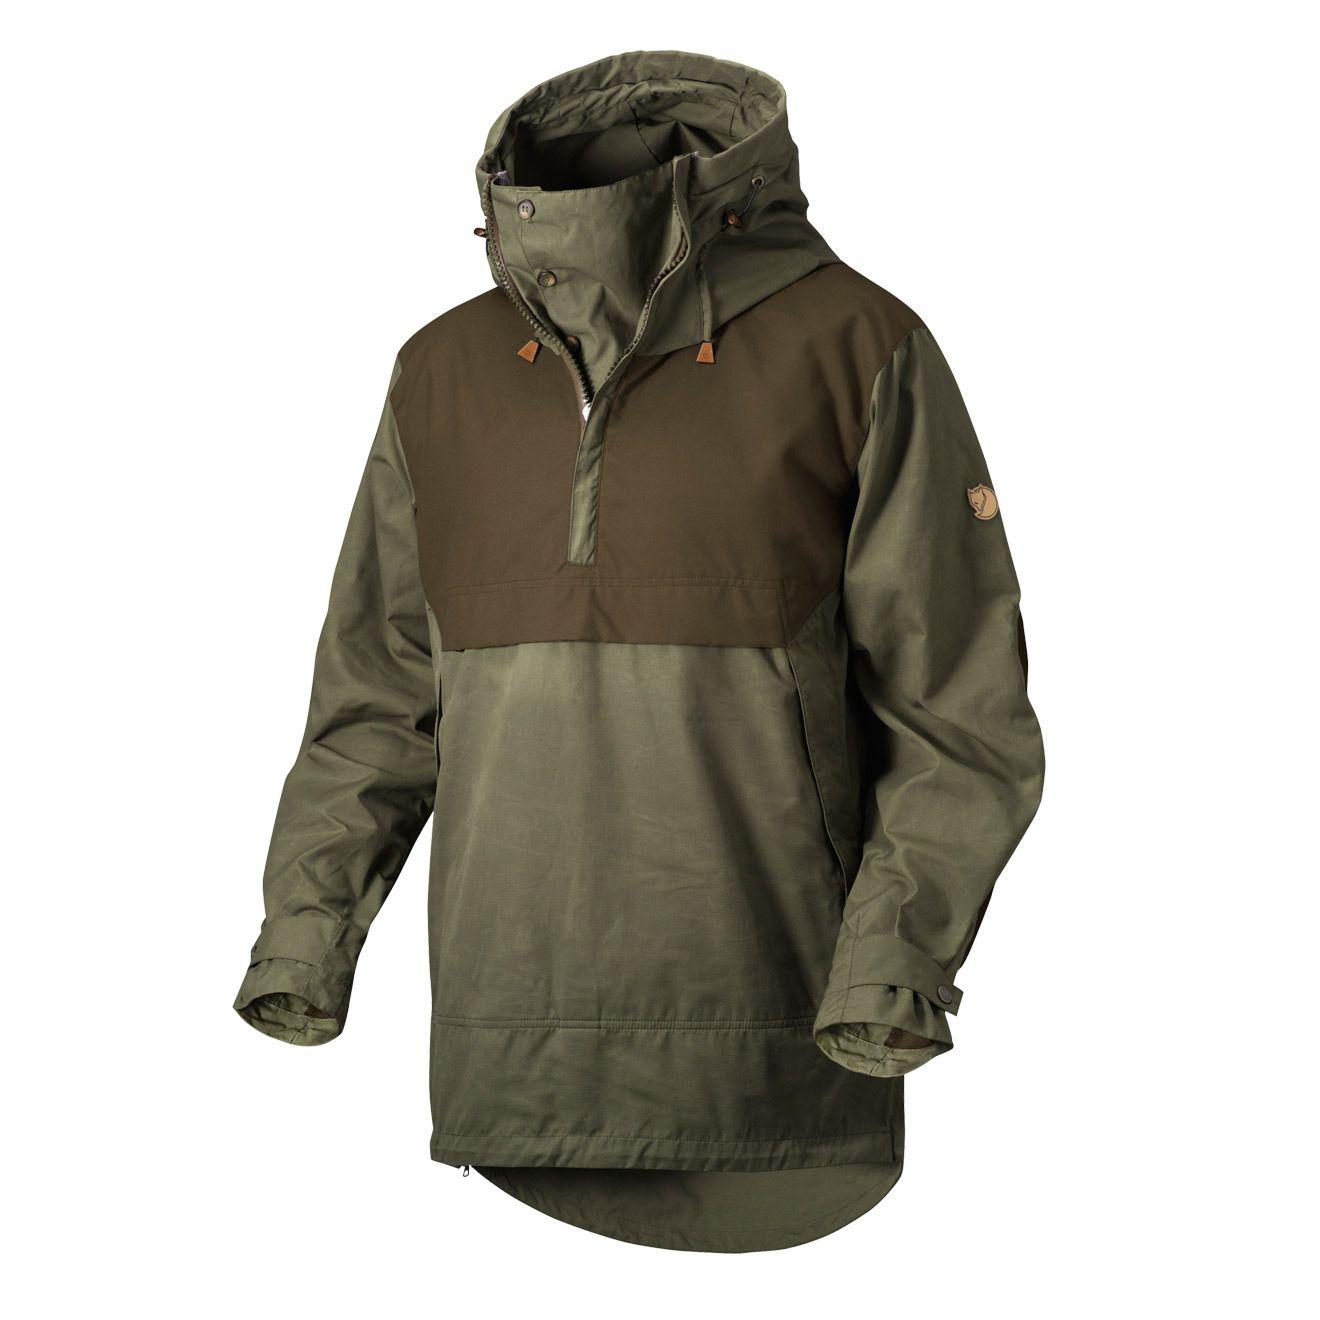 Fjallraven Anorak No. 8 Tarmac | Outdoor outfit, Tactical